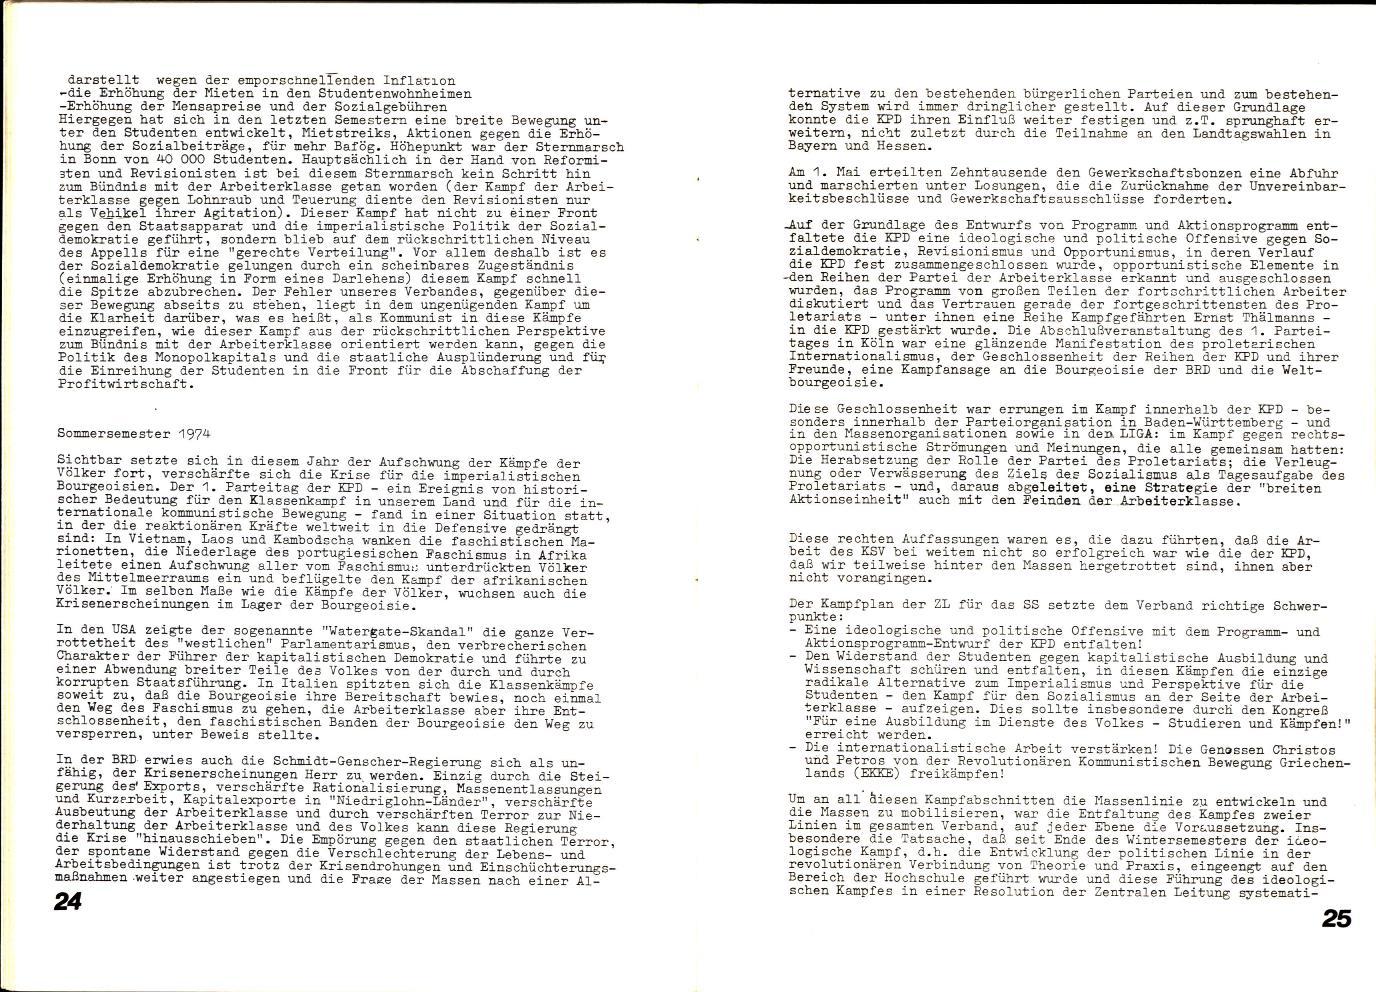 KSV_1974_Rechenschaftsbericht_14